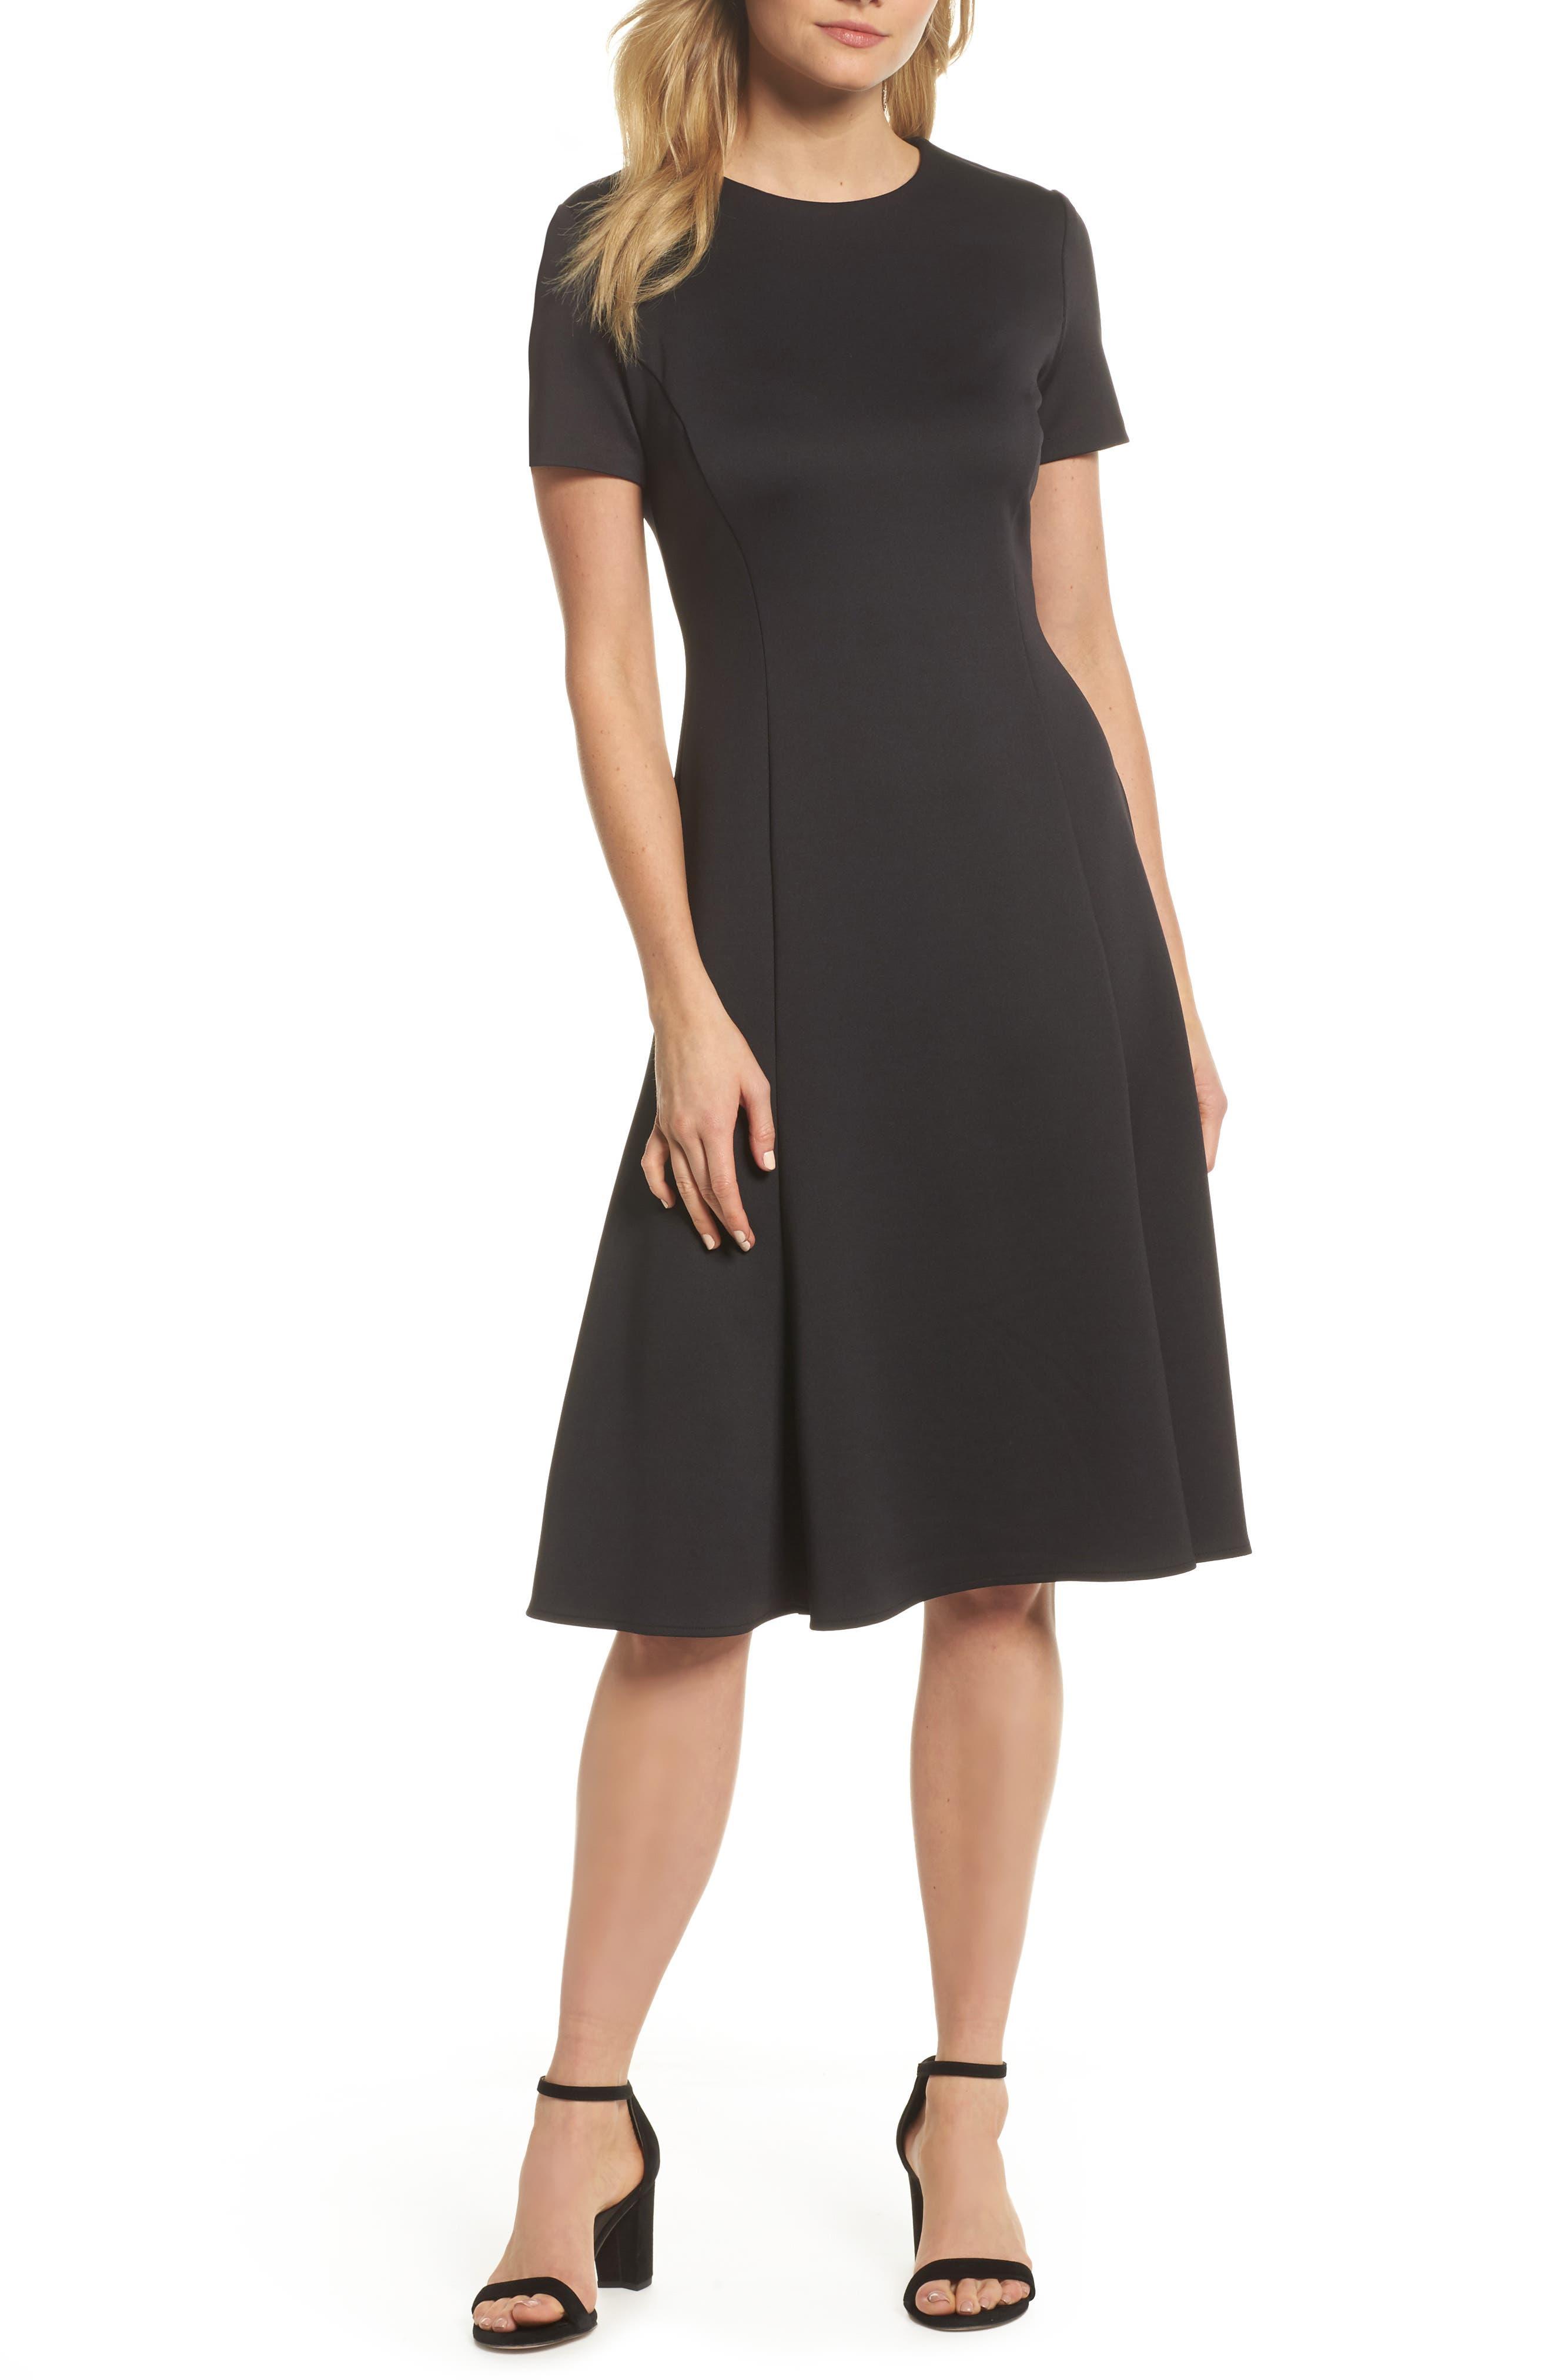 Midi Bell Dress,                         Main,                         color, Black